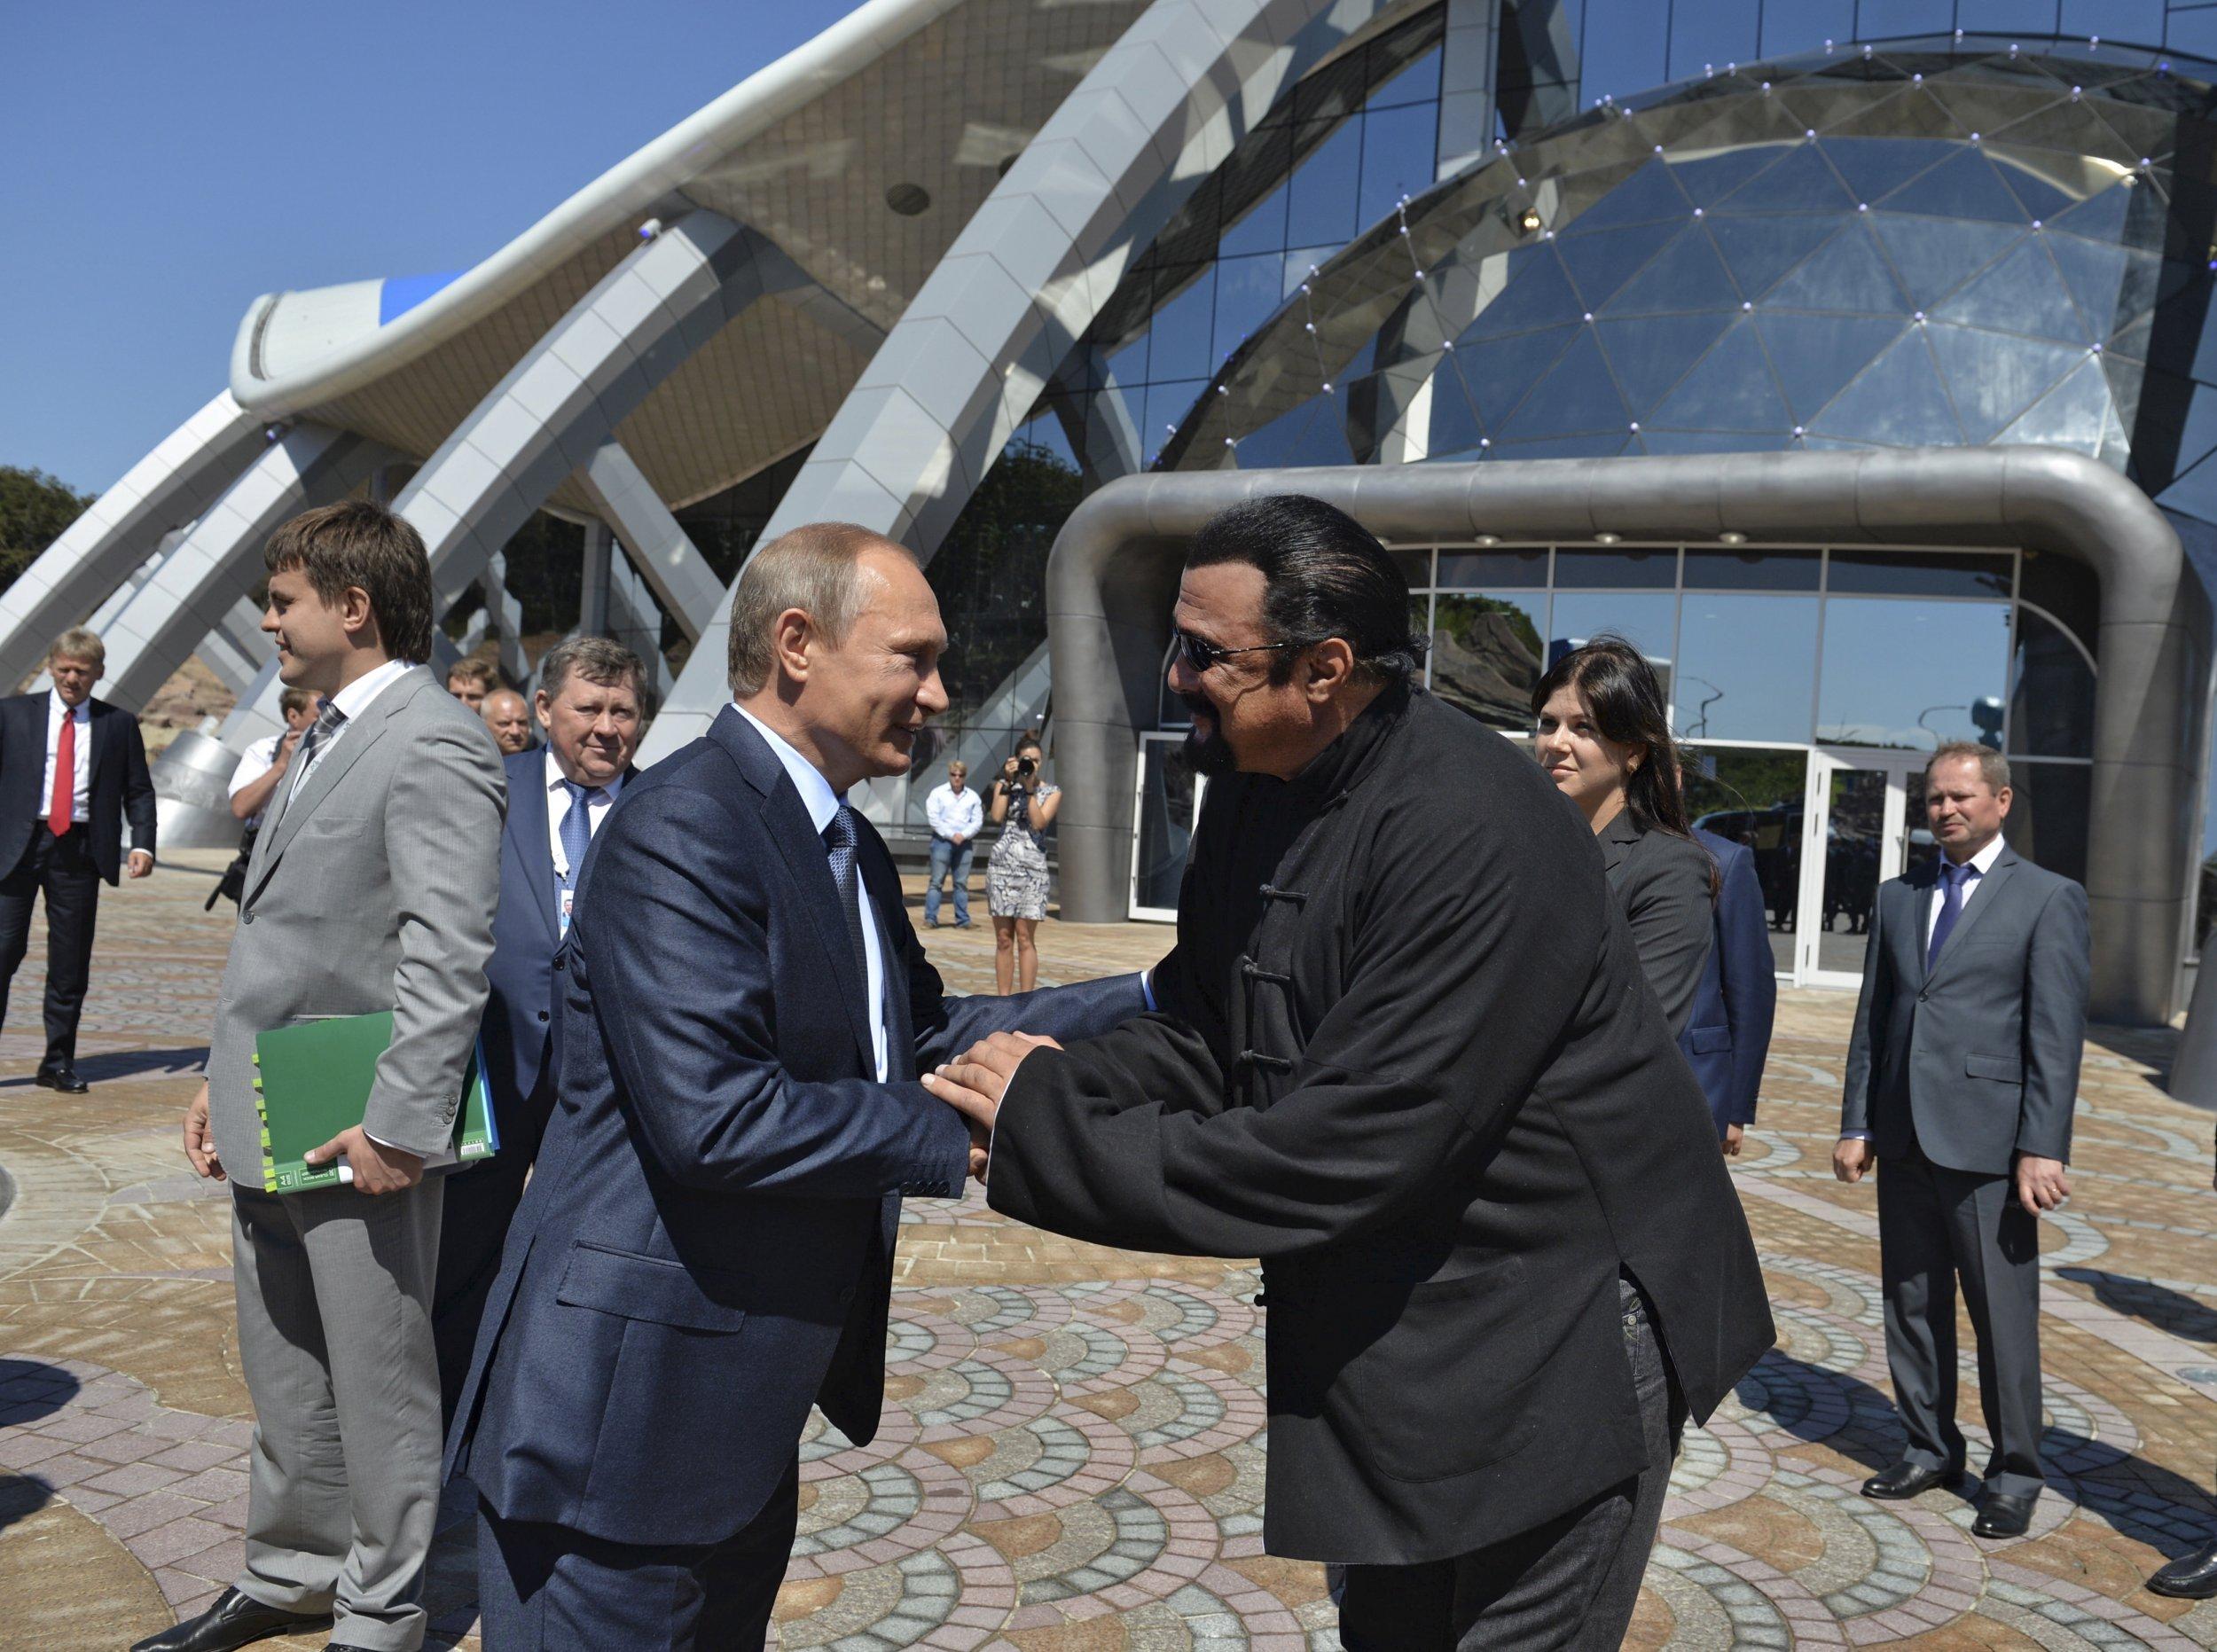 Putin and Seagal